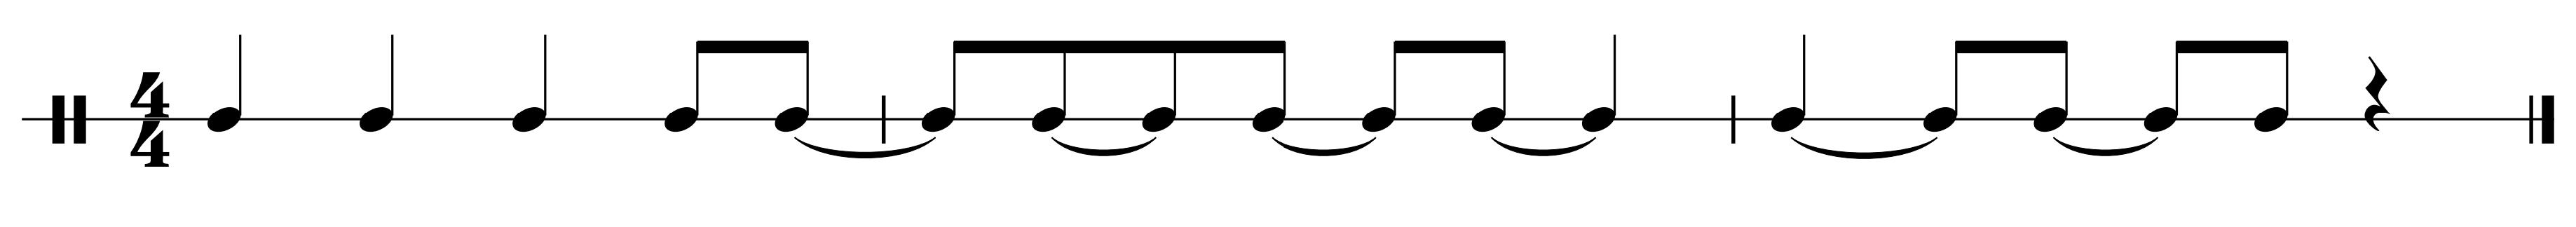 Komaniecki, Example 12b